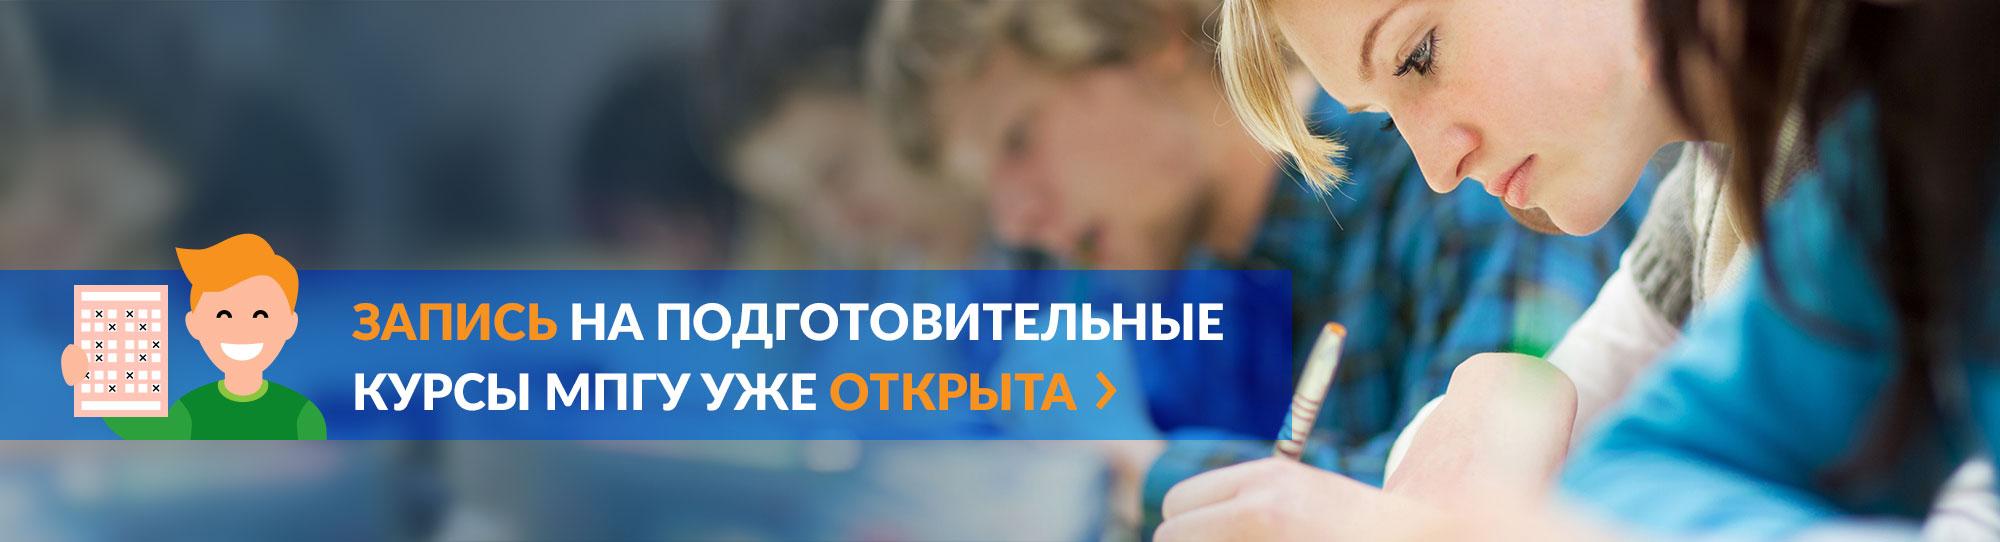 mpgu-site-big-banner-Podgot-kursy-1-1-withouttext